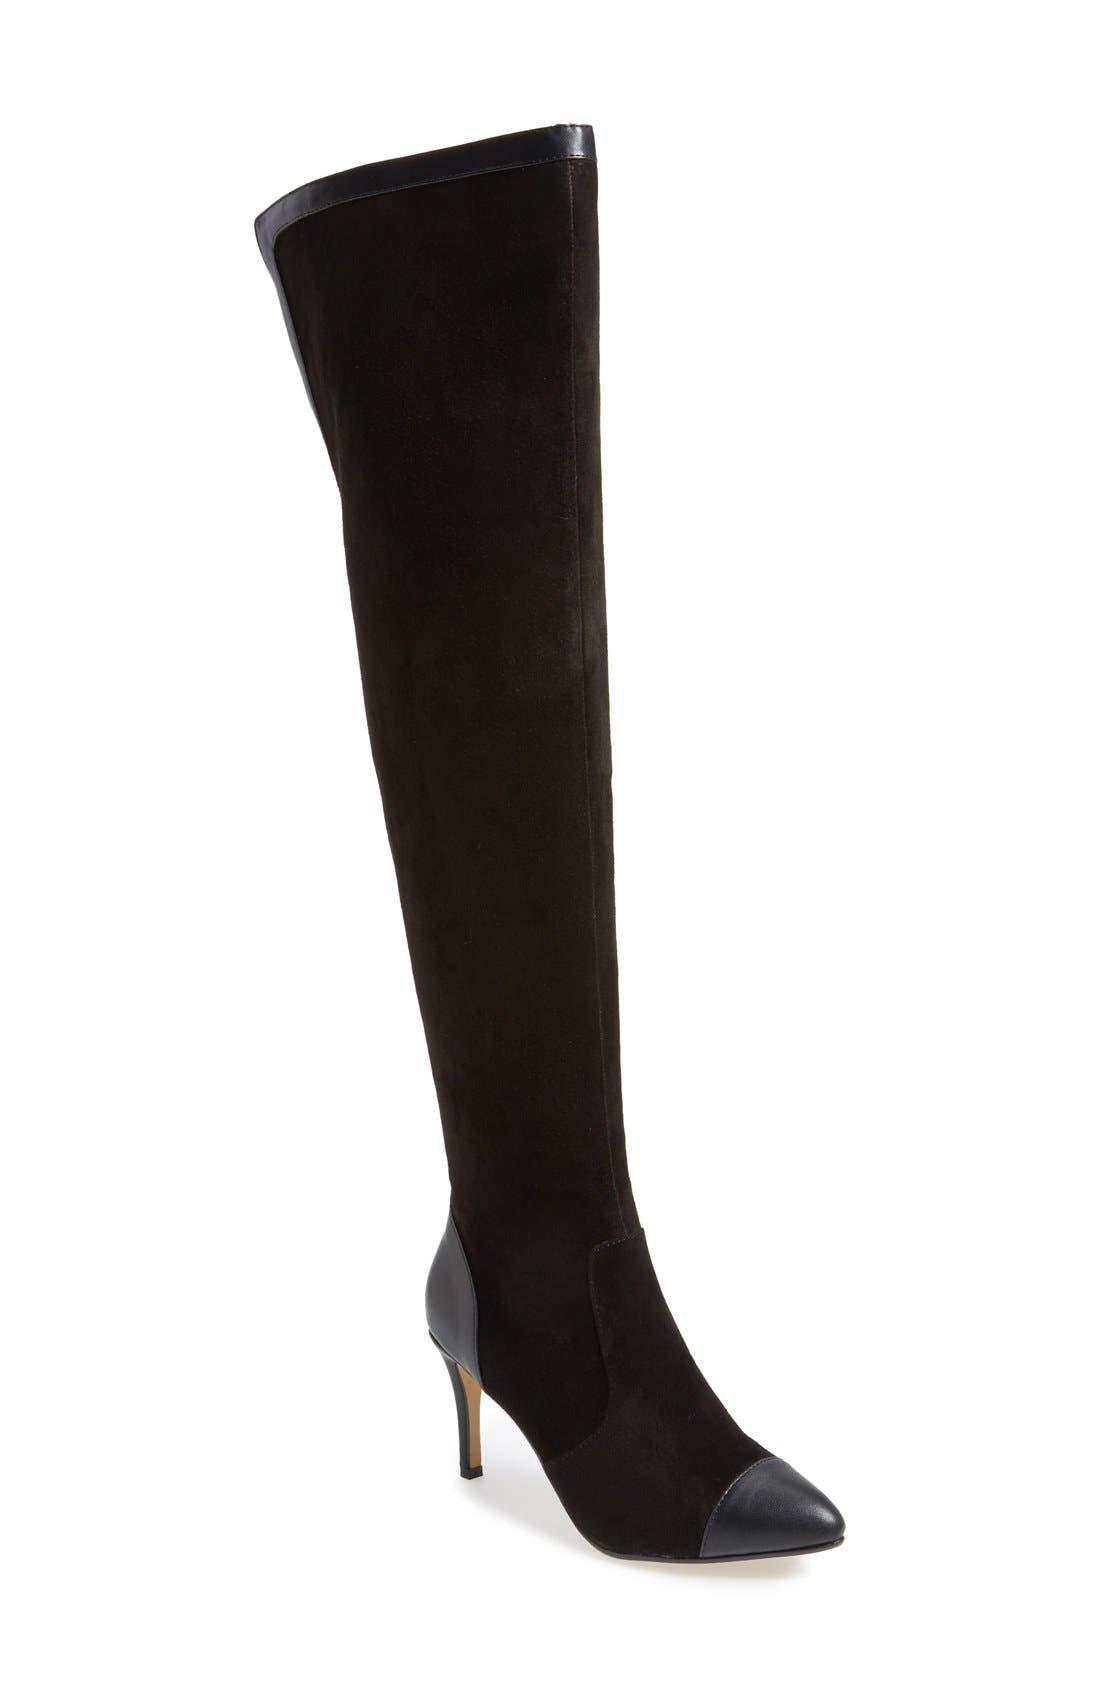 NINA ORIGINALS 'Allure' Over The Knee Boot, Main, color, 001